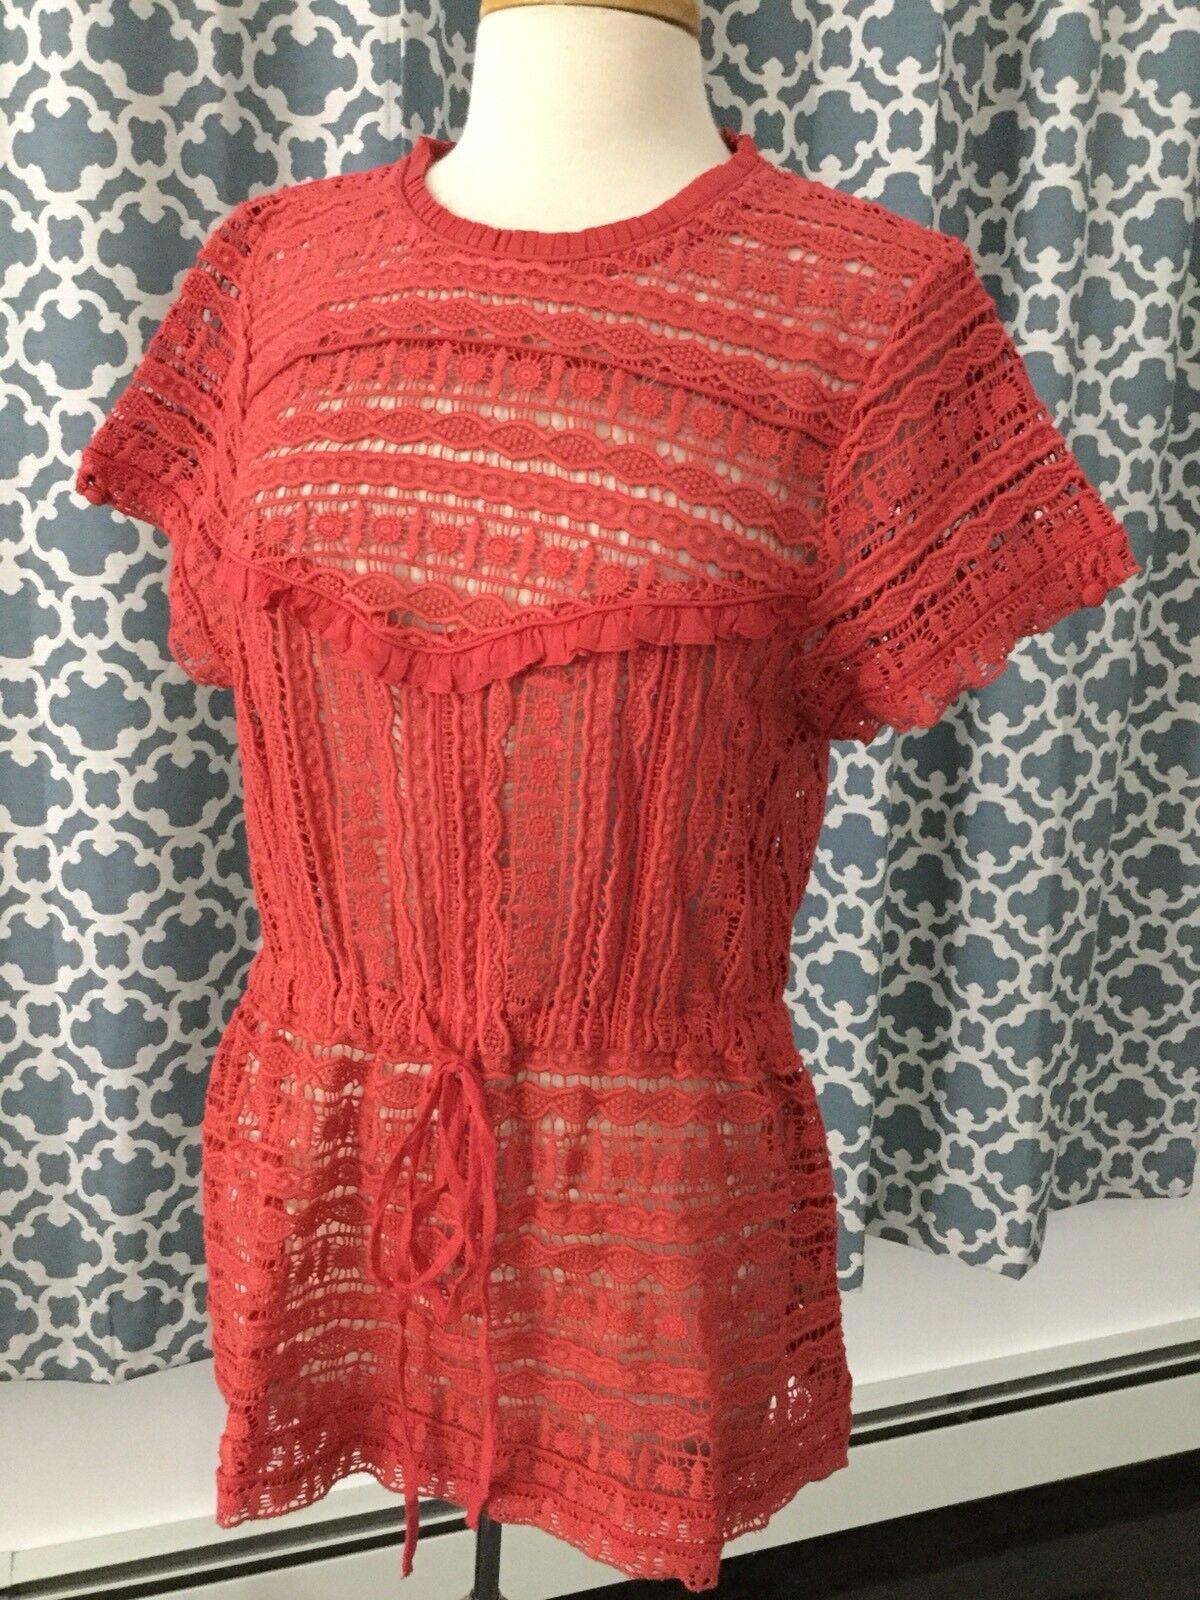 NEW  Carolina K Berenice Red Crochet Blouse Size XL